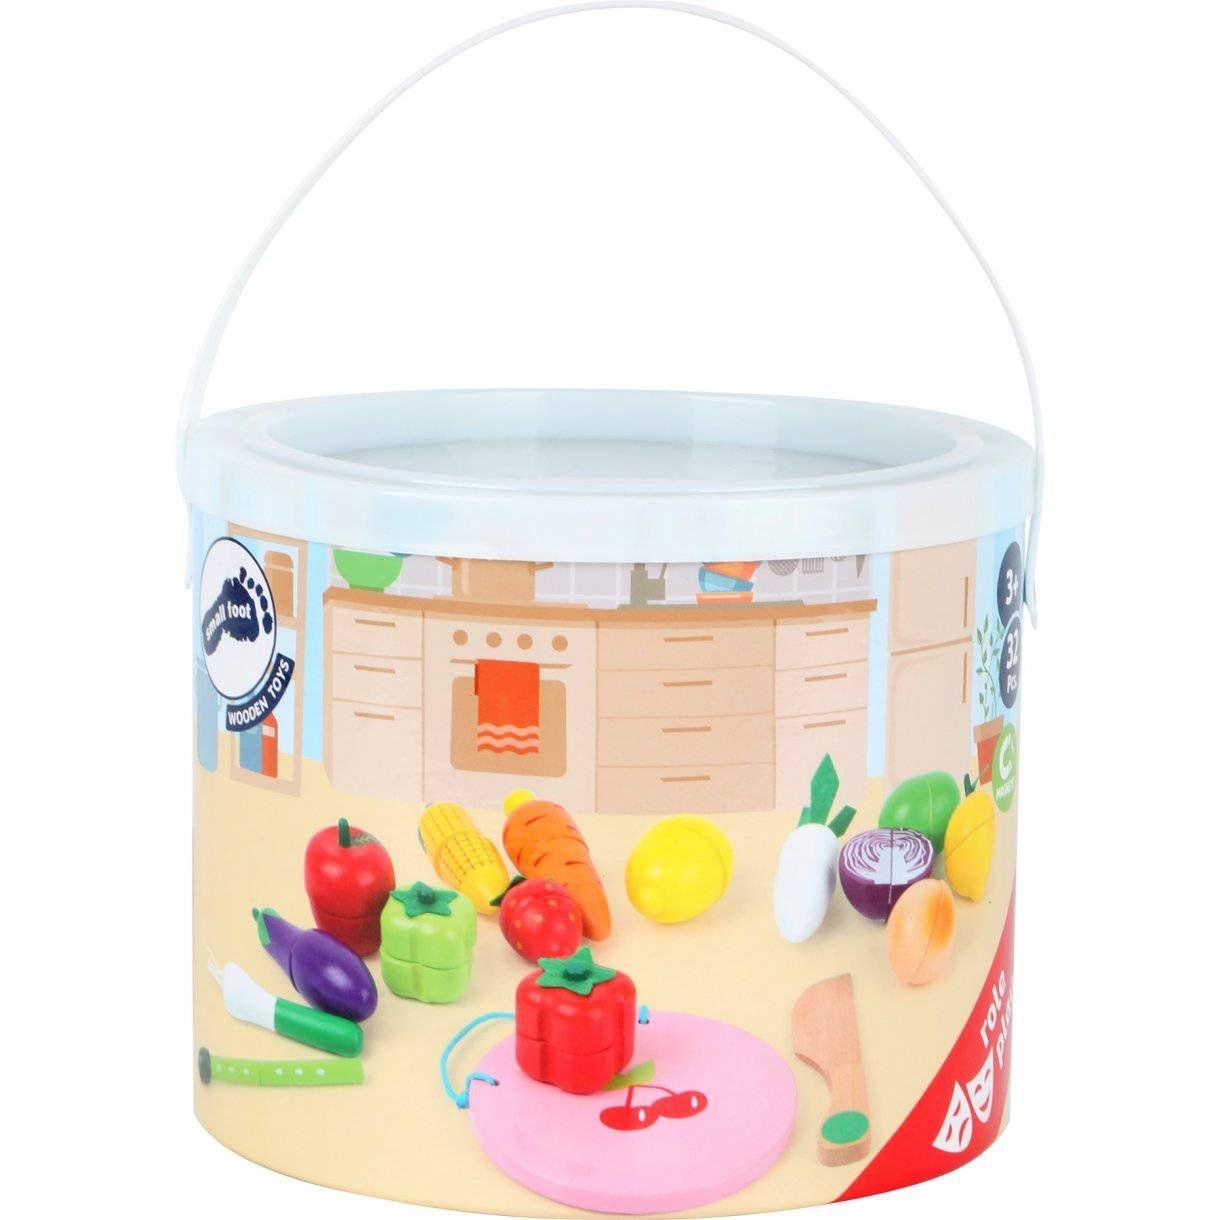 Cuttable Magnetic Fruit & Vegetable Set-2